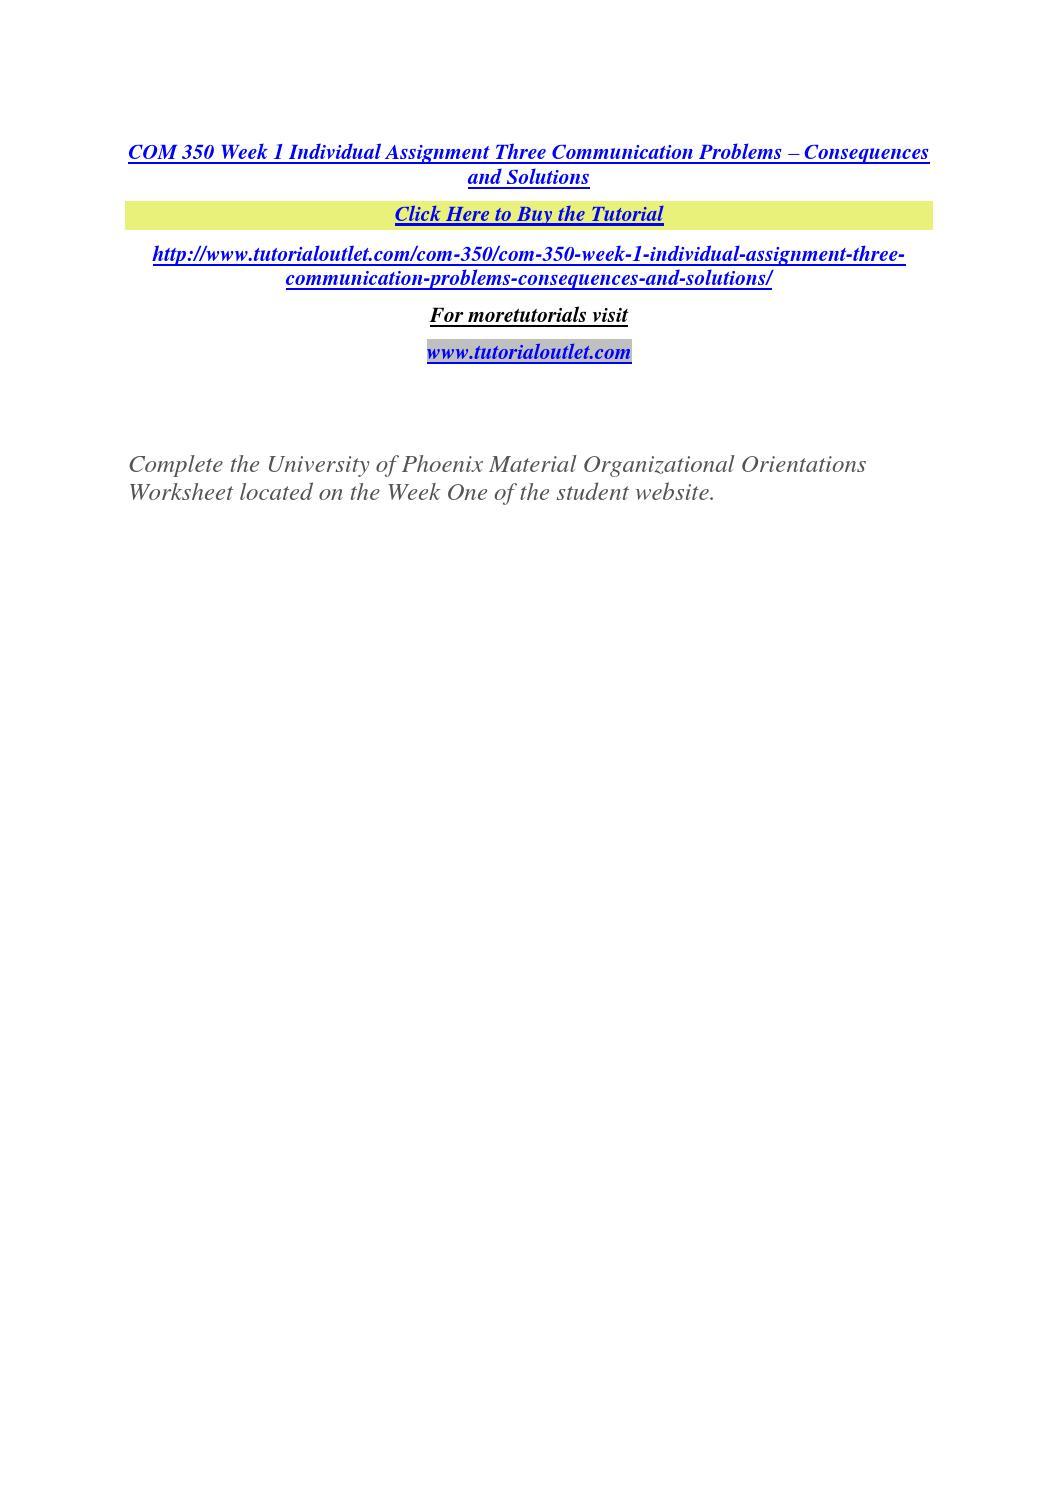 Com 350 week 1 individual assignment three communication